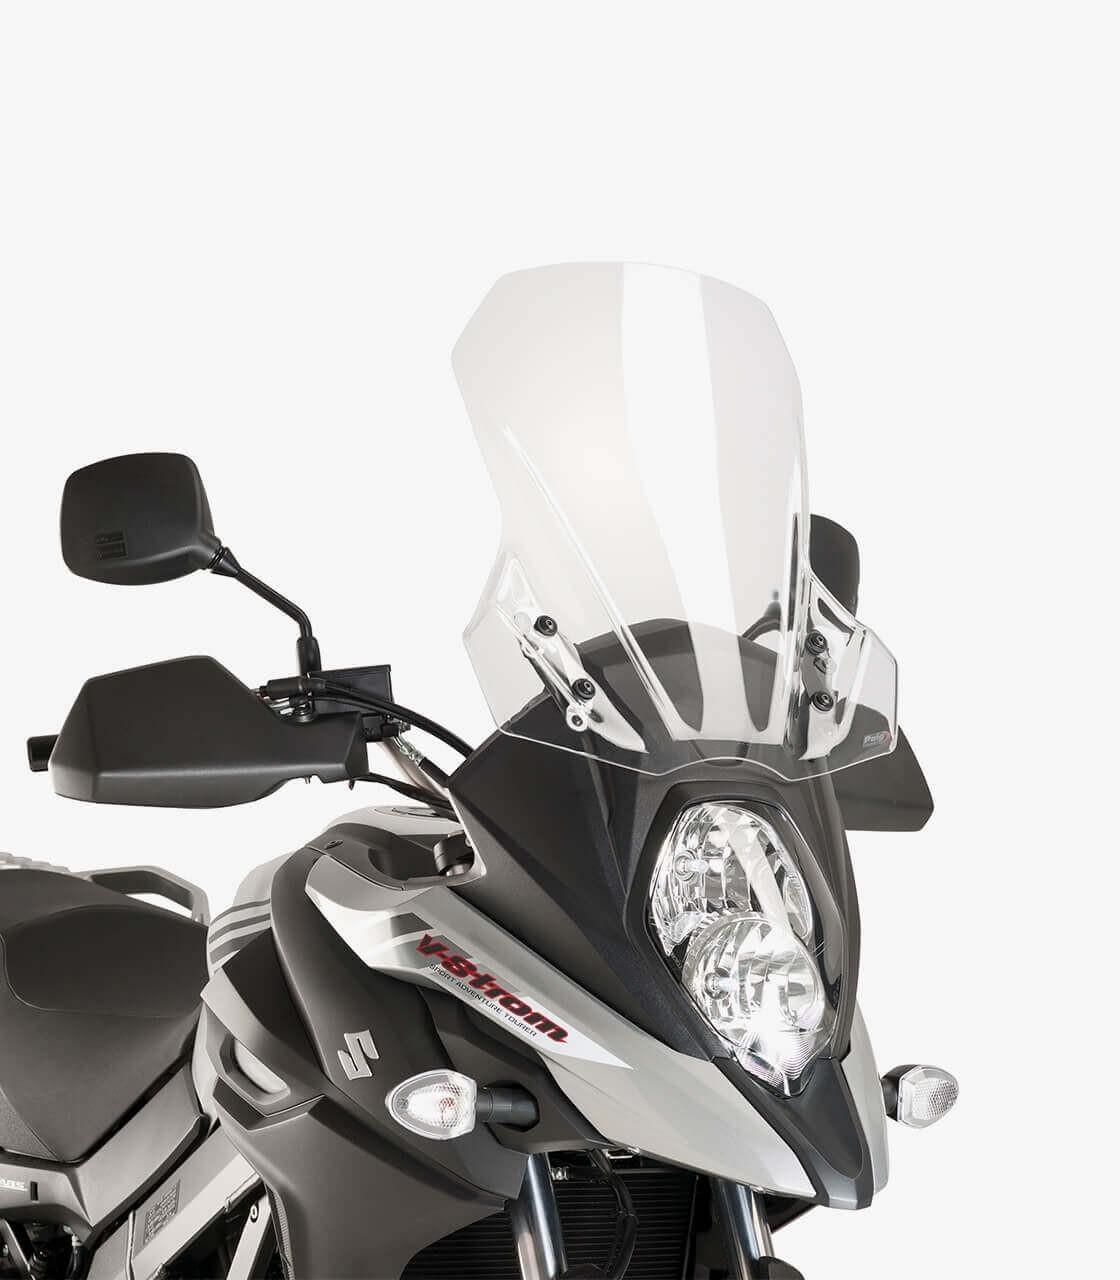 Puig 9719W Touring Screen for Model Suzuki DL650 V-Strom ...